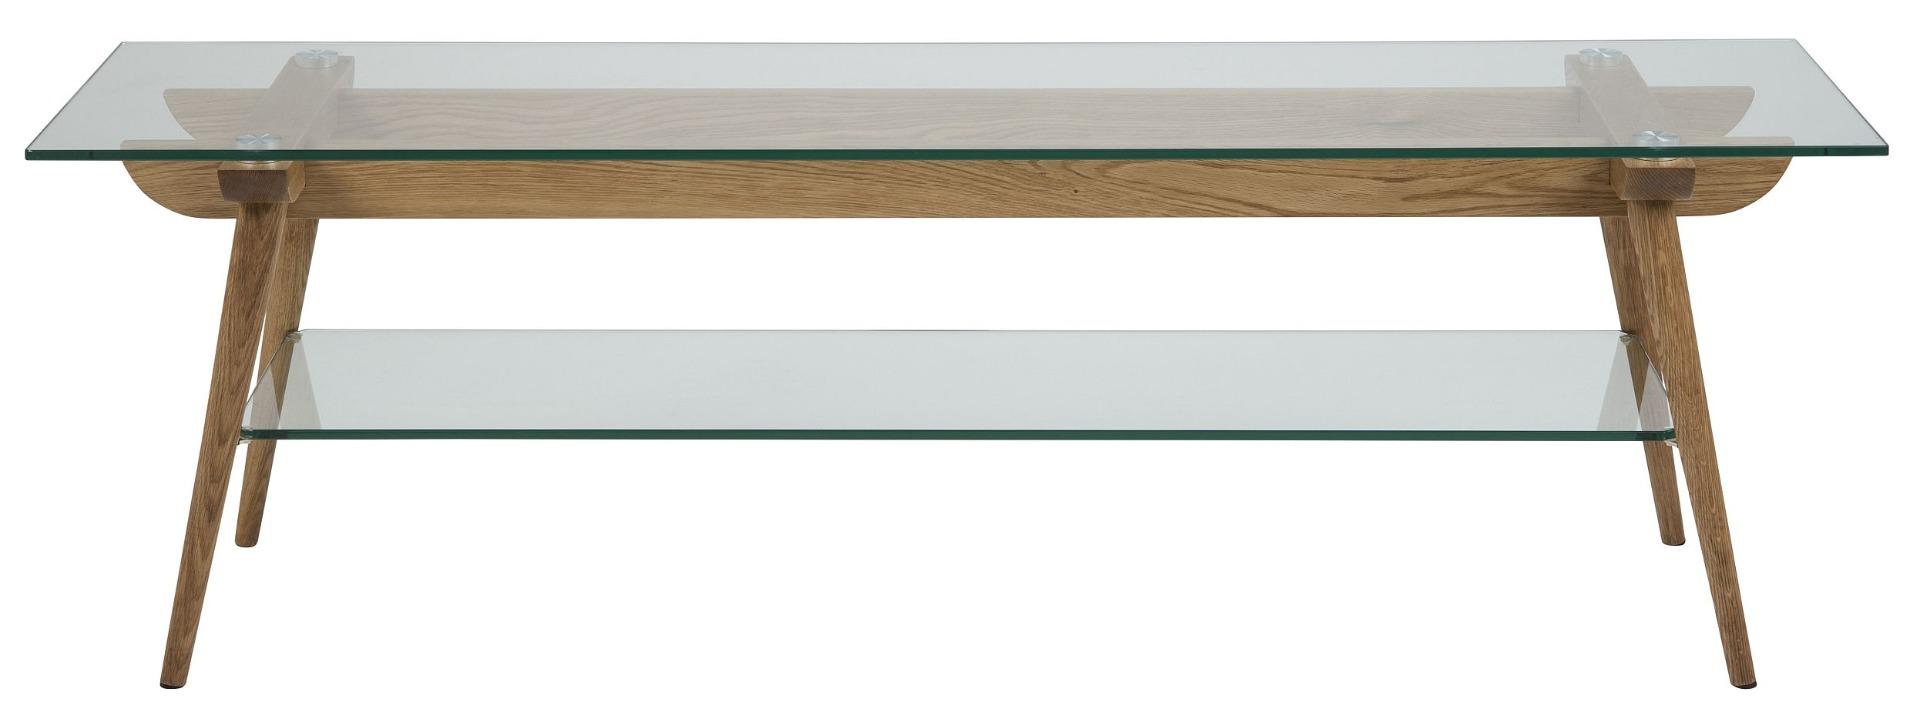 24Designs TV-Meubel Alvar - L160 X B45 X H50 Cm - Glazen Tafelblad - Eikenhouten Poten